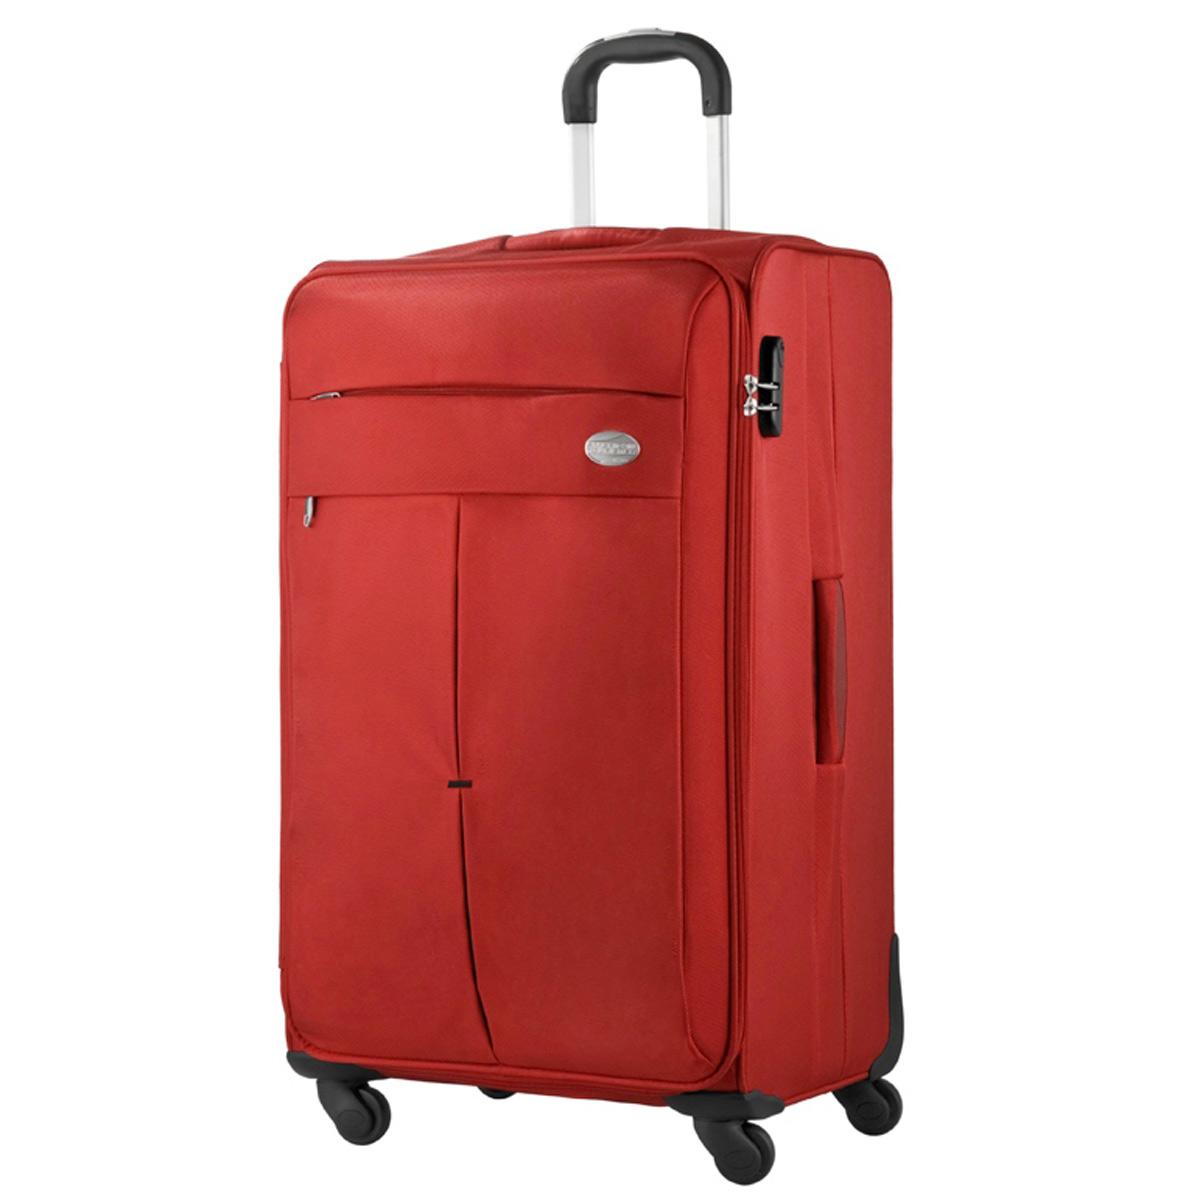 american tourister samsonite colora spinner 76cm trolley koffer rot neu ebay. Black Bedroom Furniture Sets. Home Design Ideas